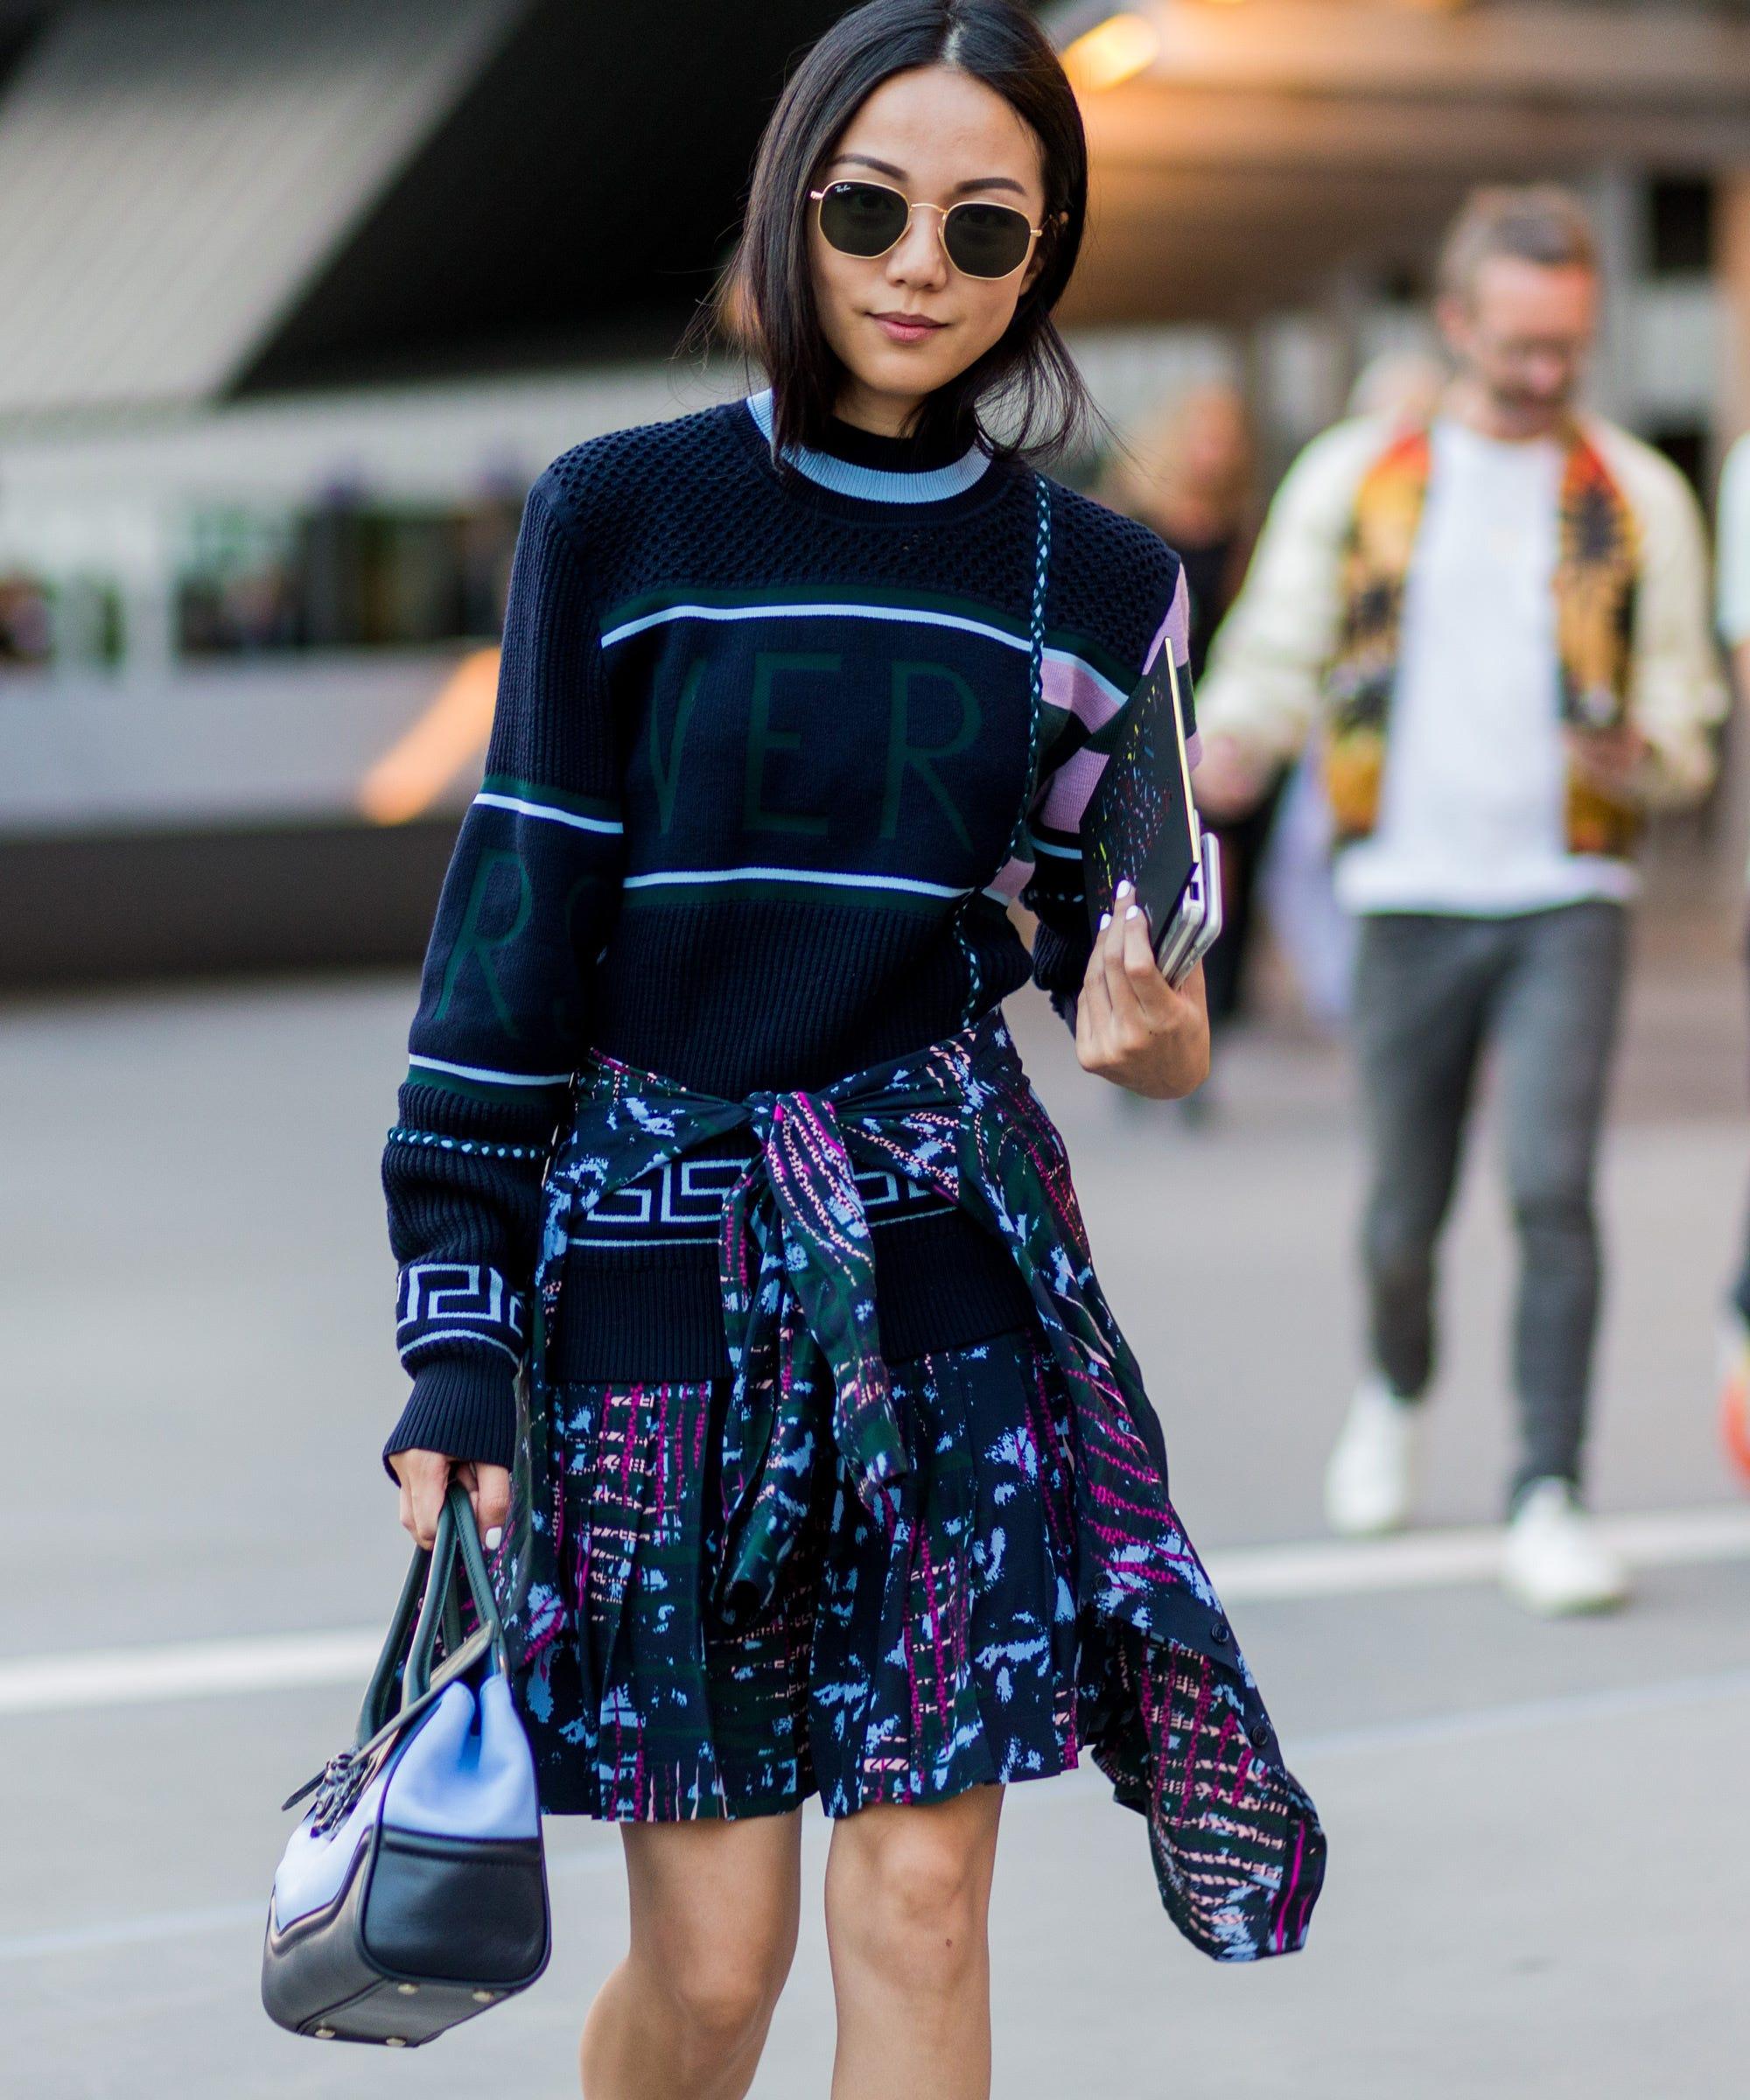 fb3c57eadbc8c Fall Outfit Inspiration - MFW Street Style Photos 2016